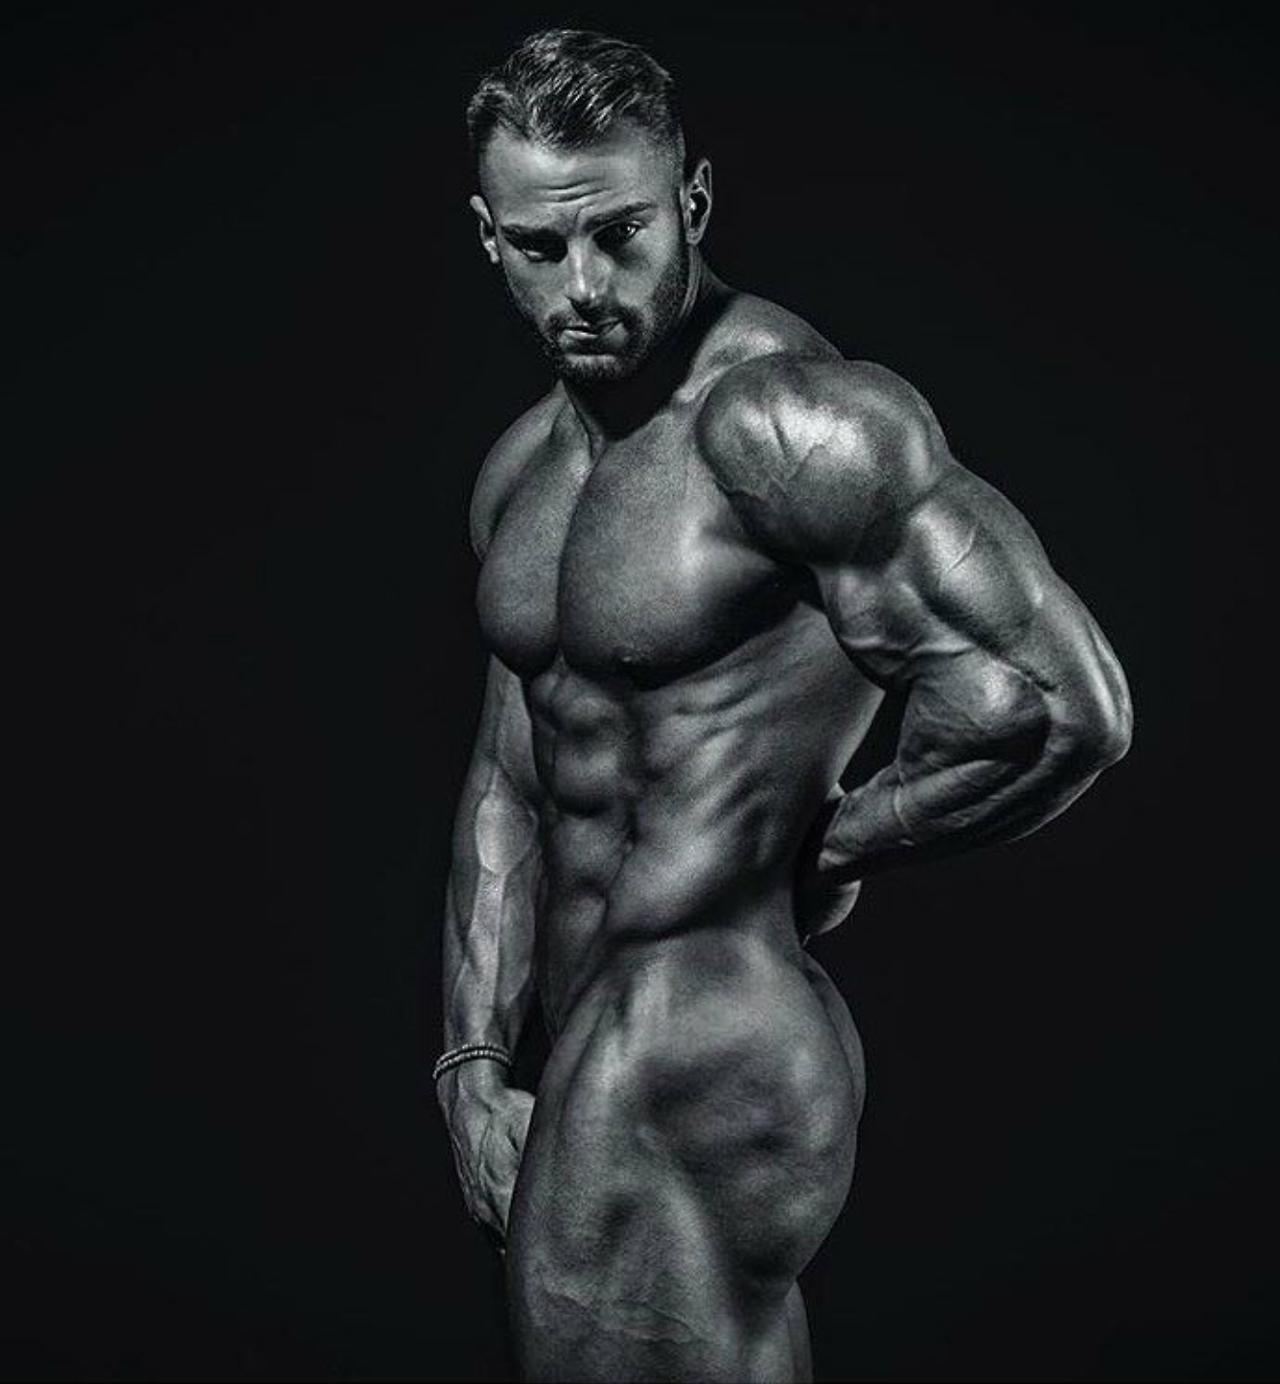 Eric Janicki   Fitness, Bodybuilding, Inspiration  for Bodybuilding Art Photography  103wja